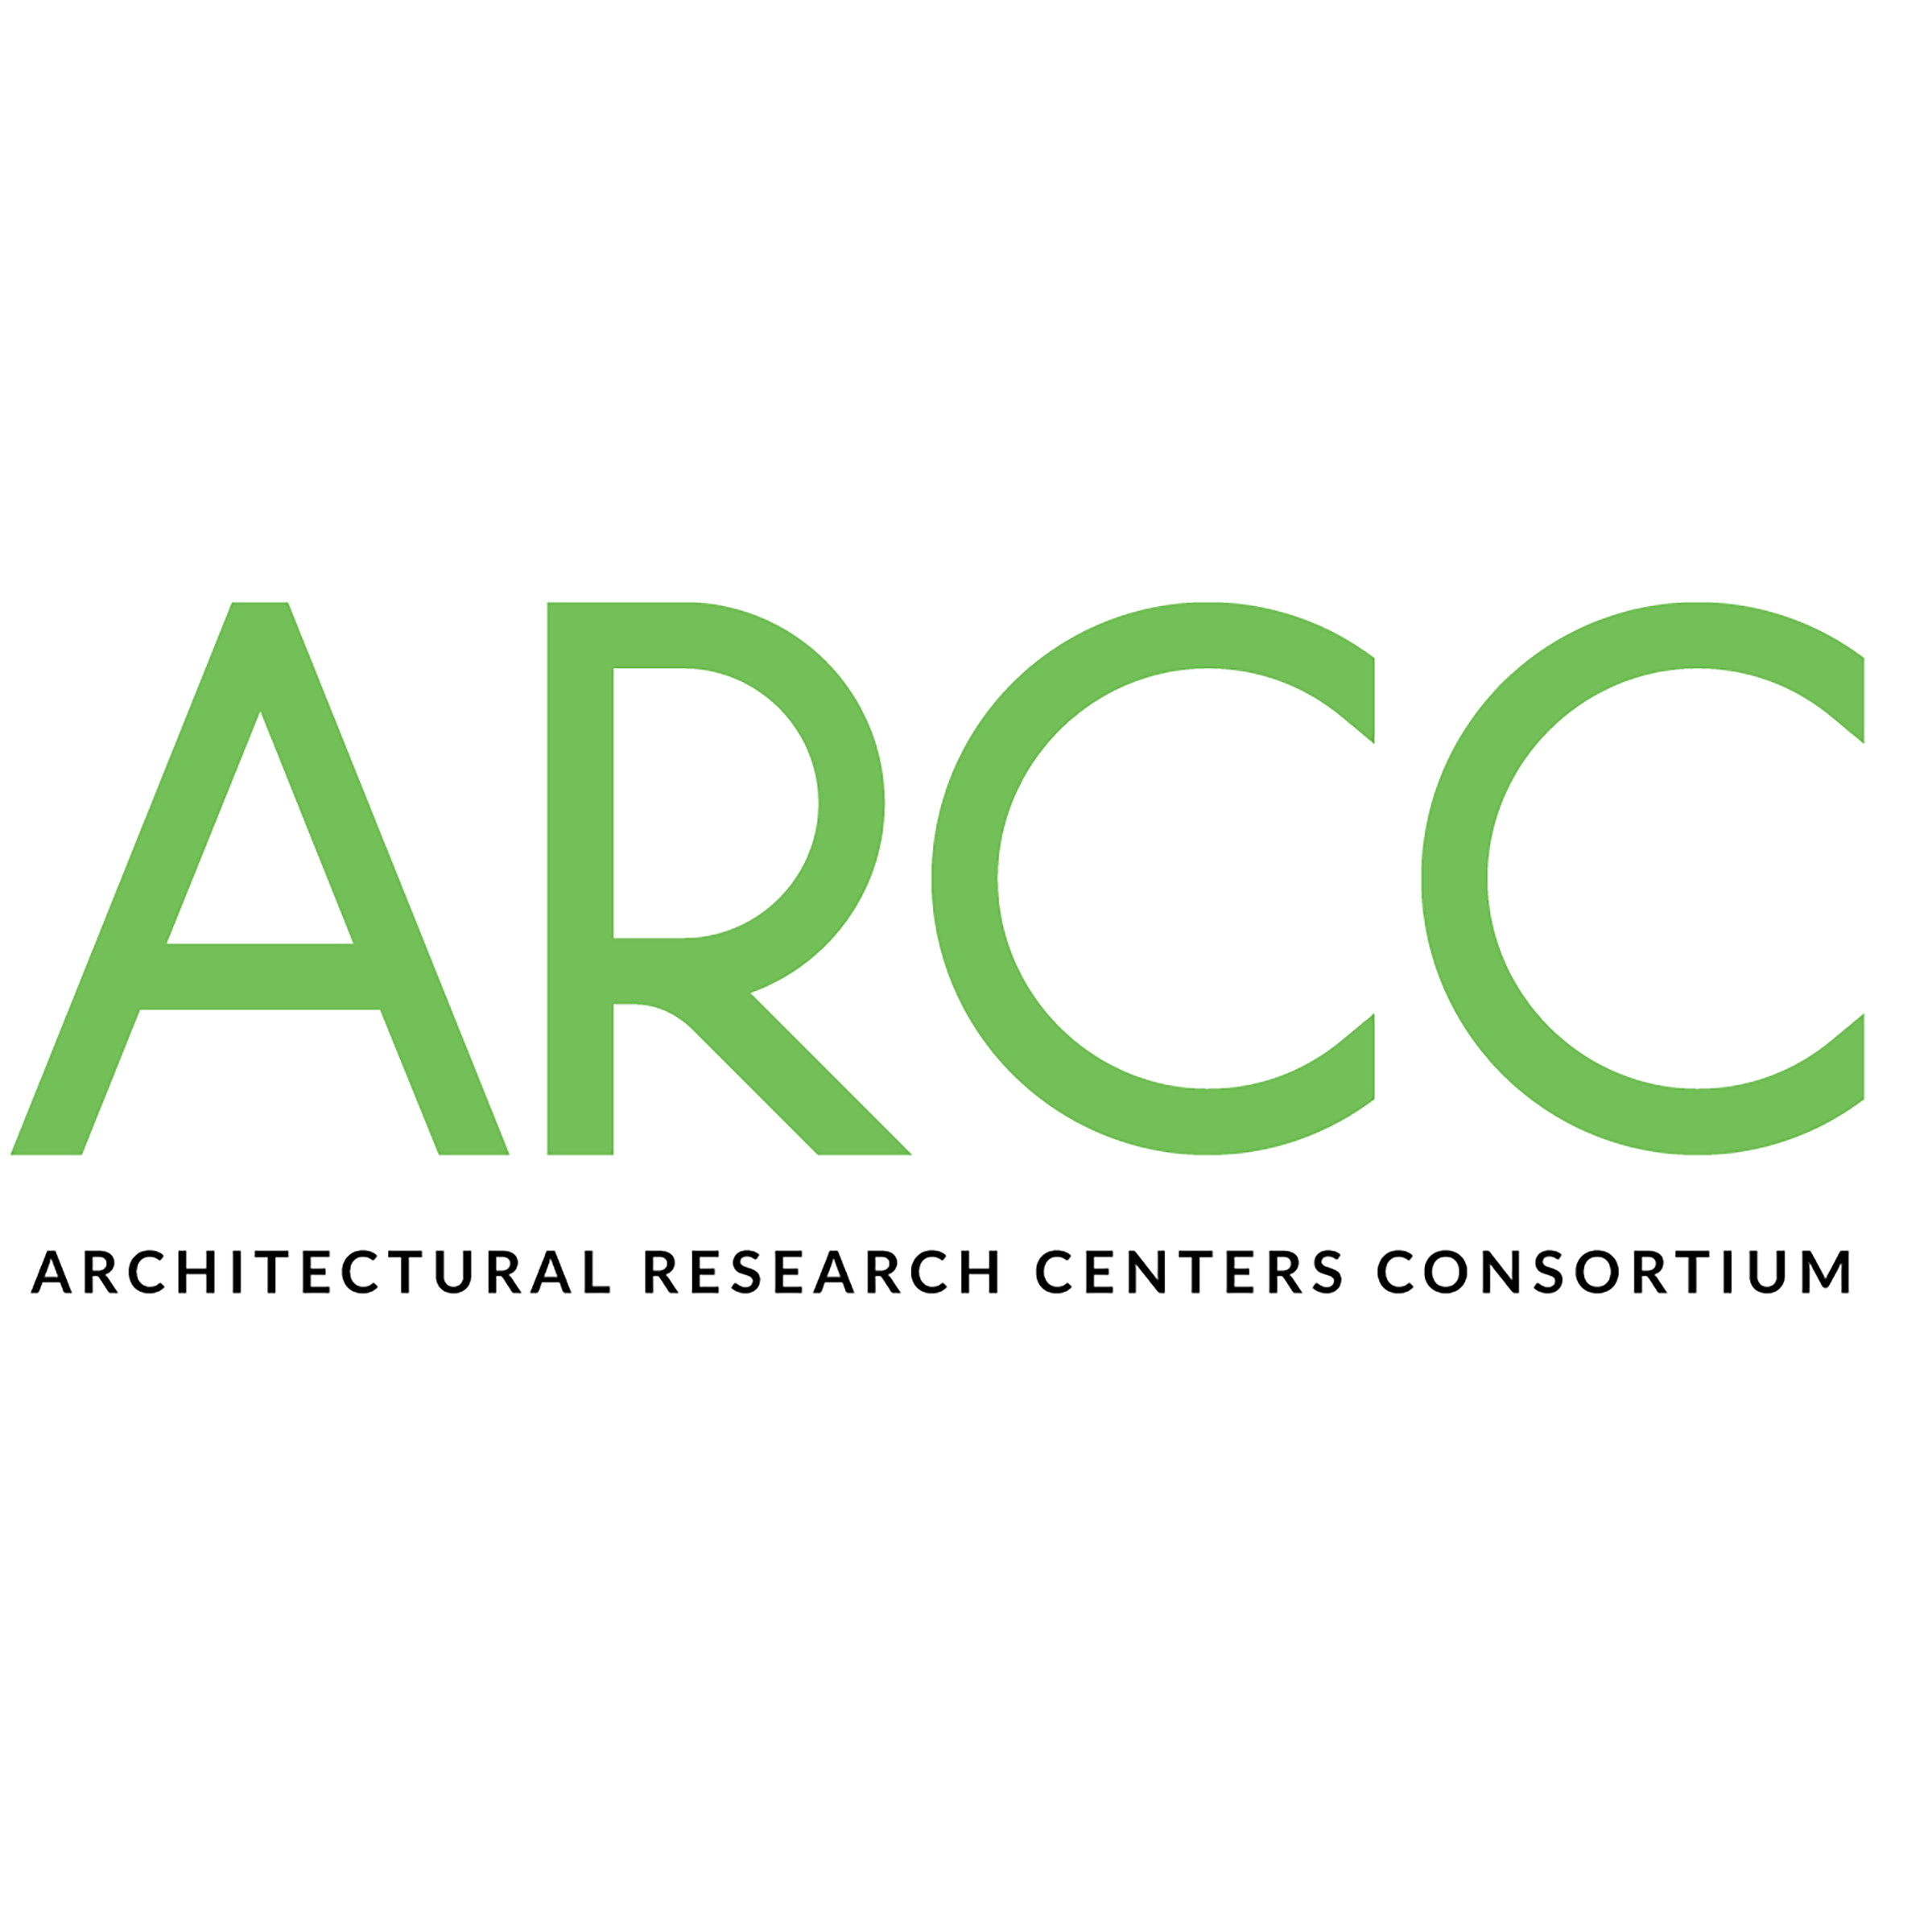 Architectural Research Centers Consortium (ARCC) logo